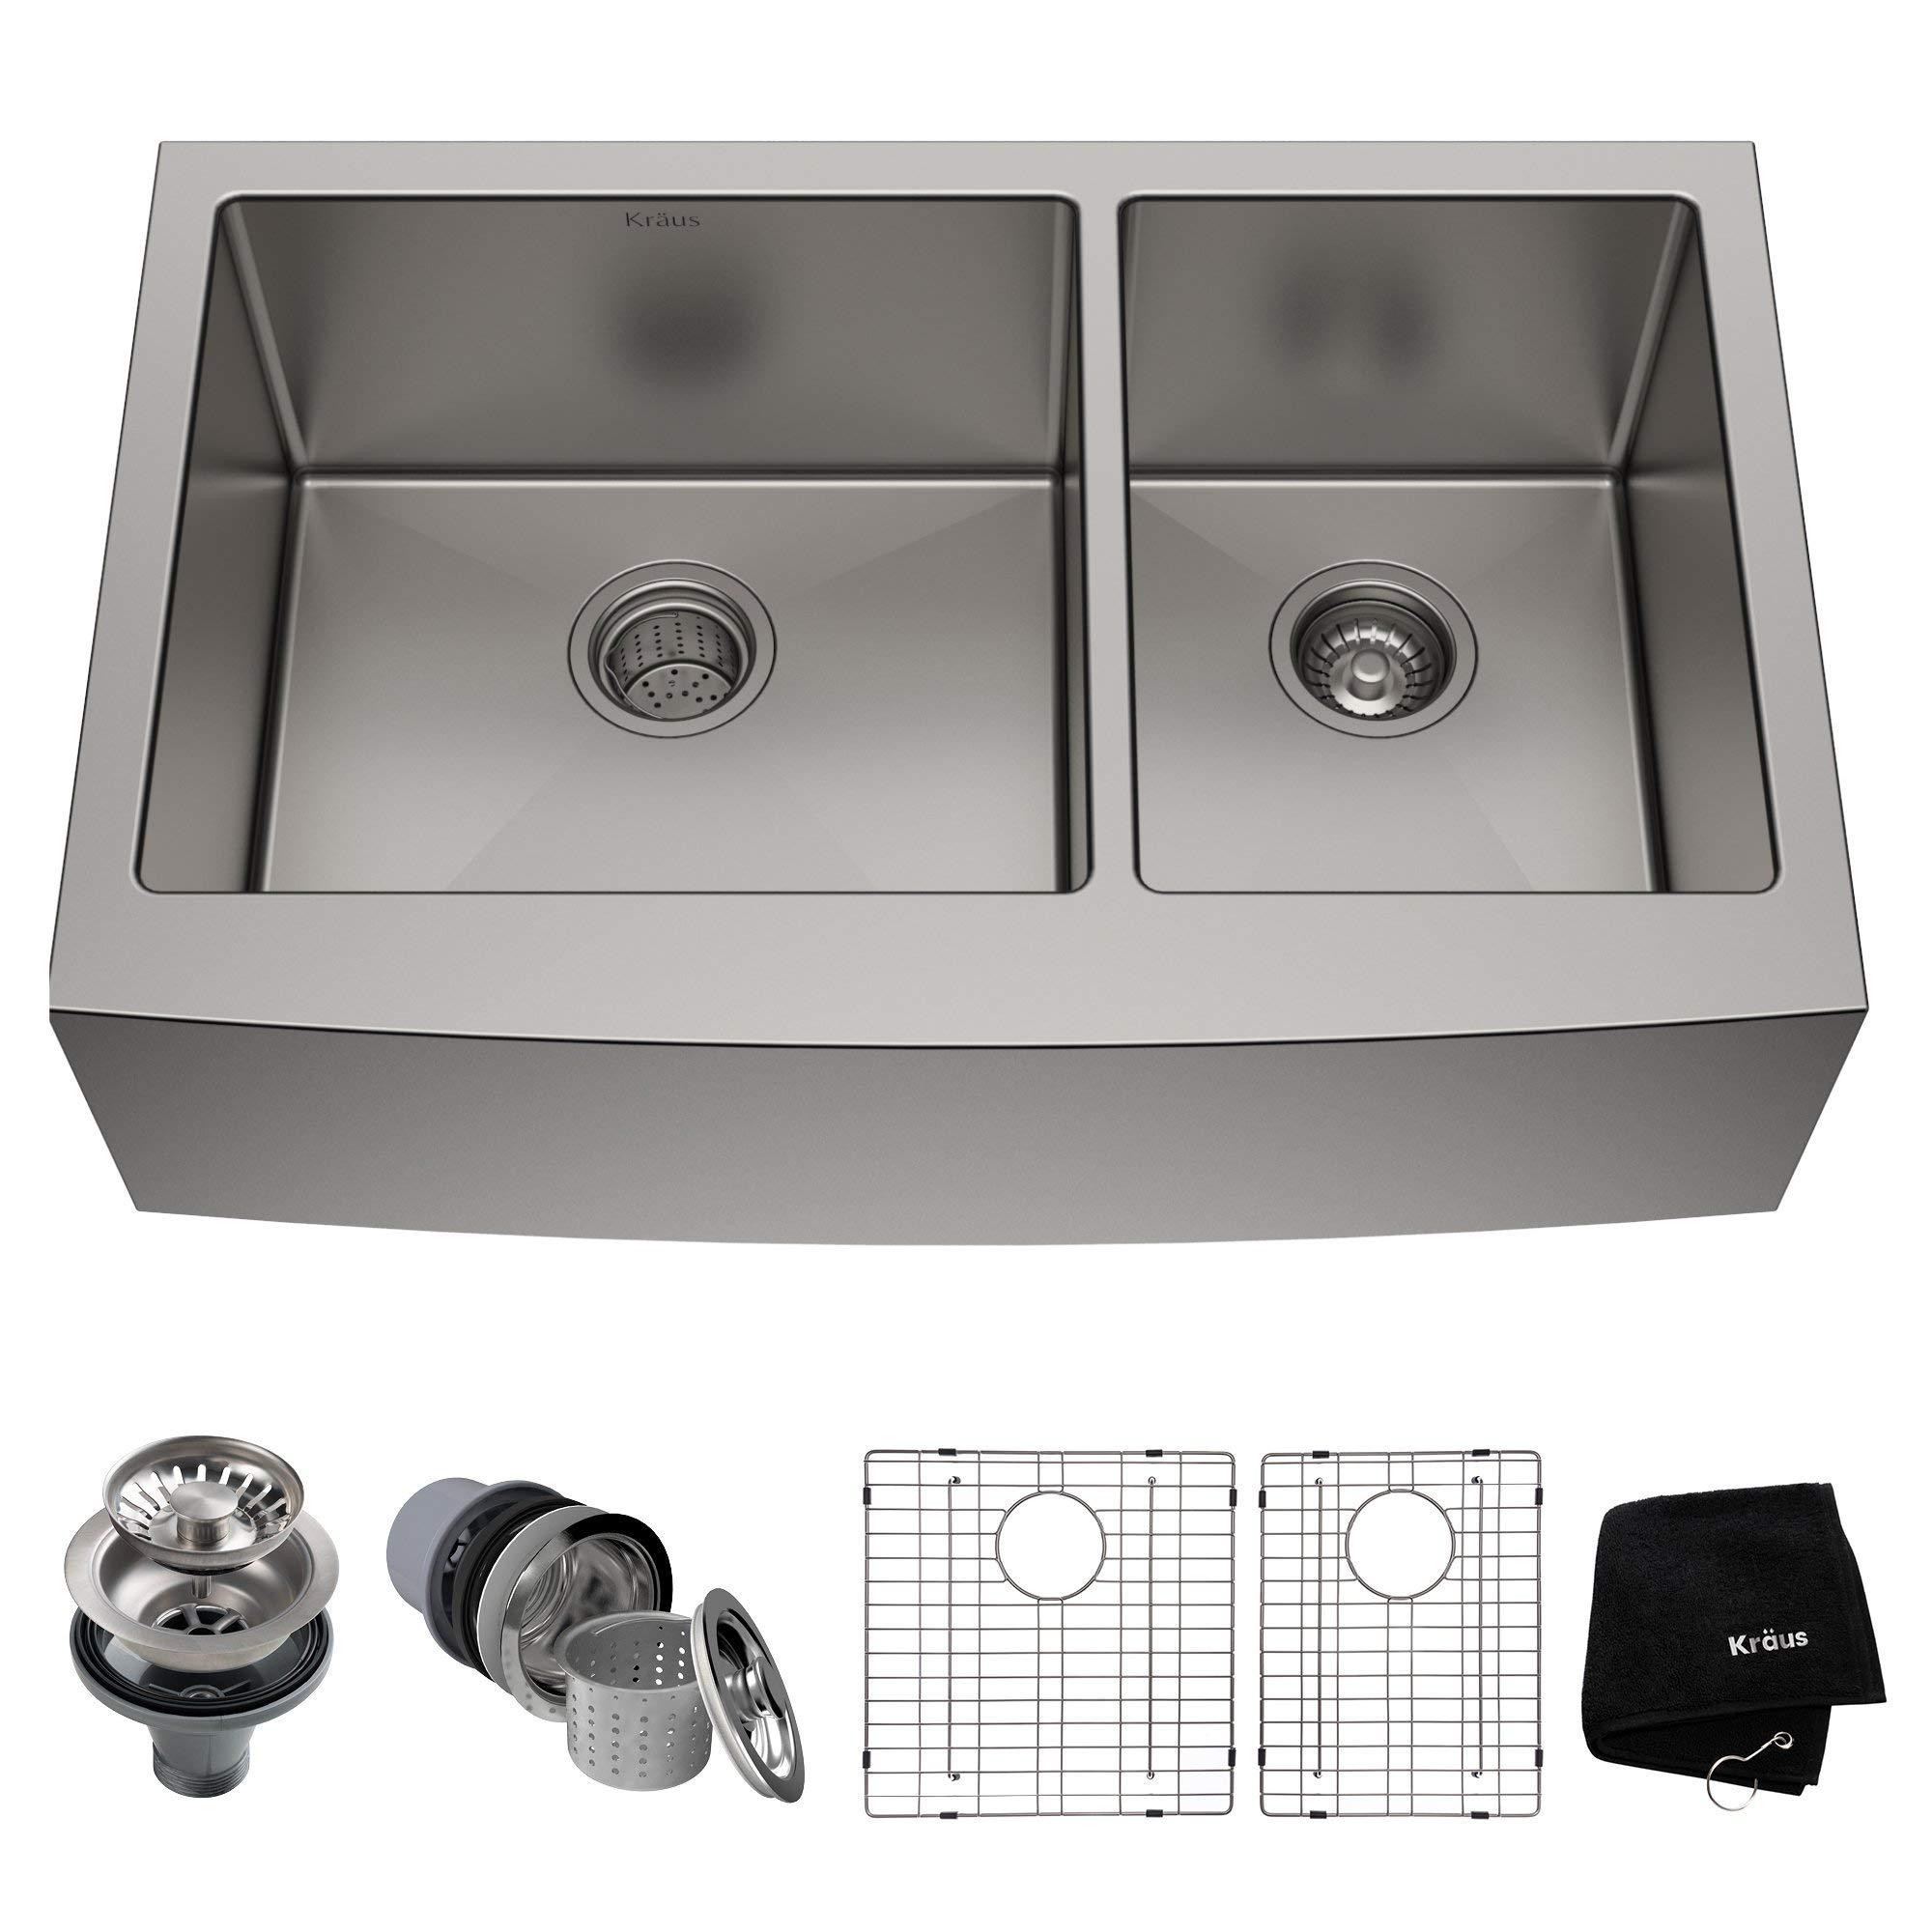 Kraus KHF203-36 36 inch Farmhouse Apron 60/40 Double Bowl 16 gauge Stainless Steel Kitchen Sink (Renewed)